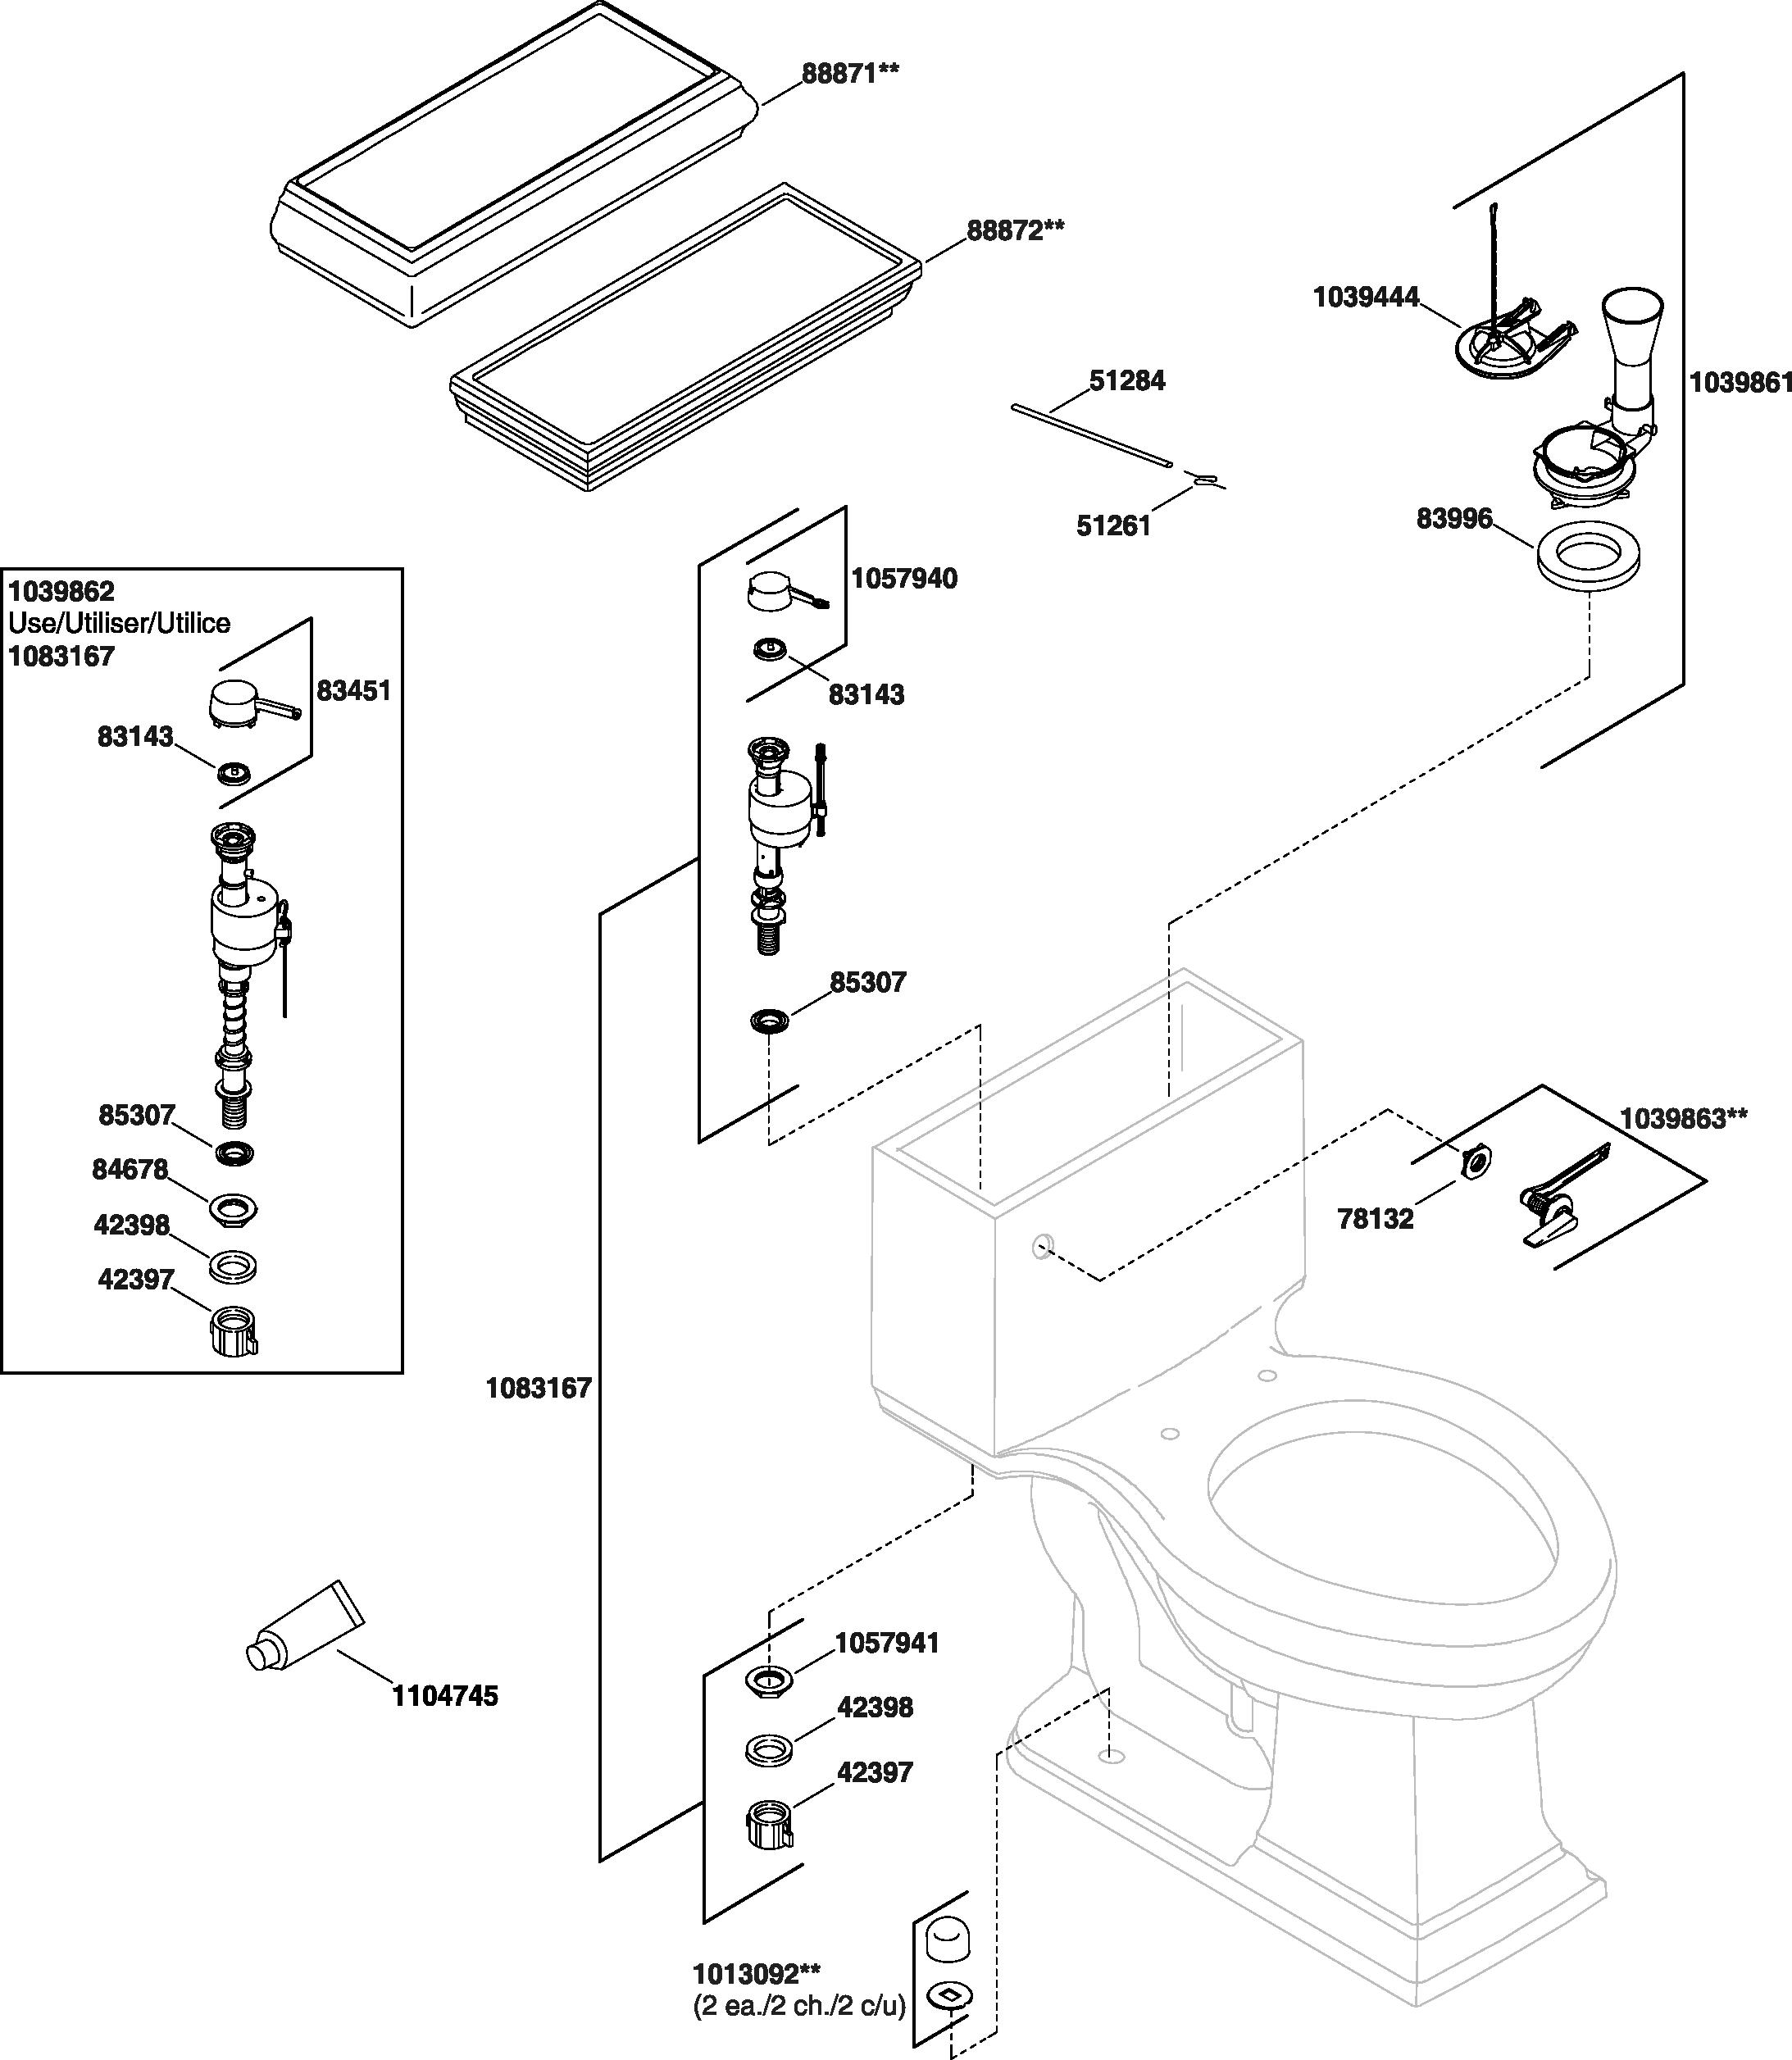 Kohler K 16109 4 Parts List And Diagram: Kohler K-3451 Memoirs Toilet Parts